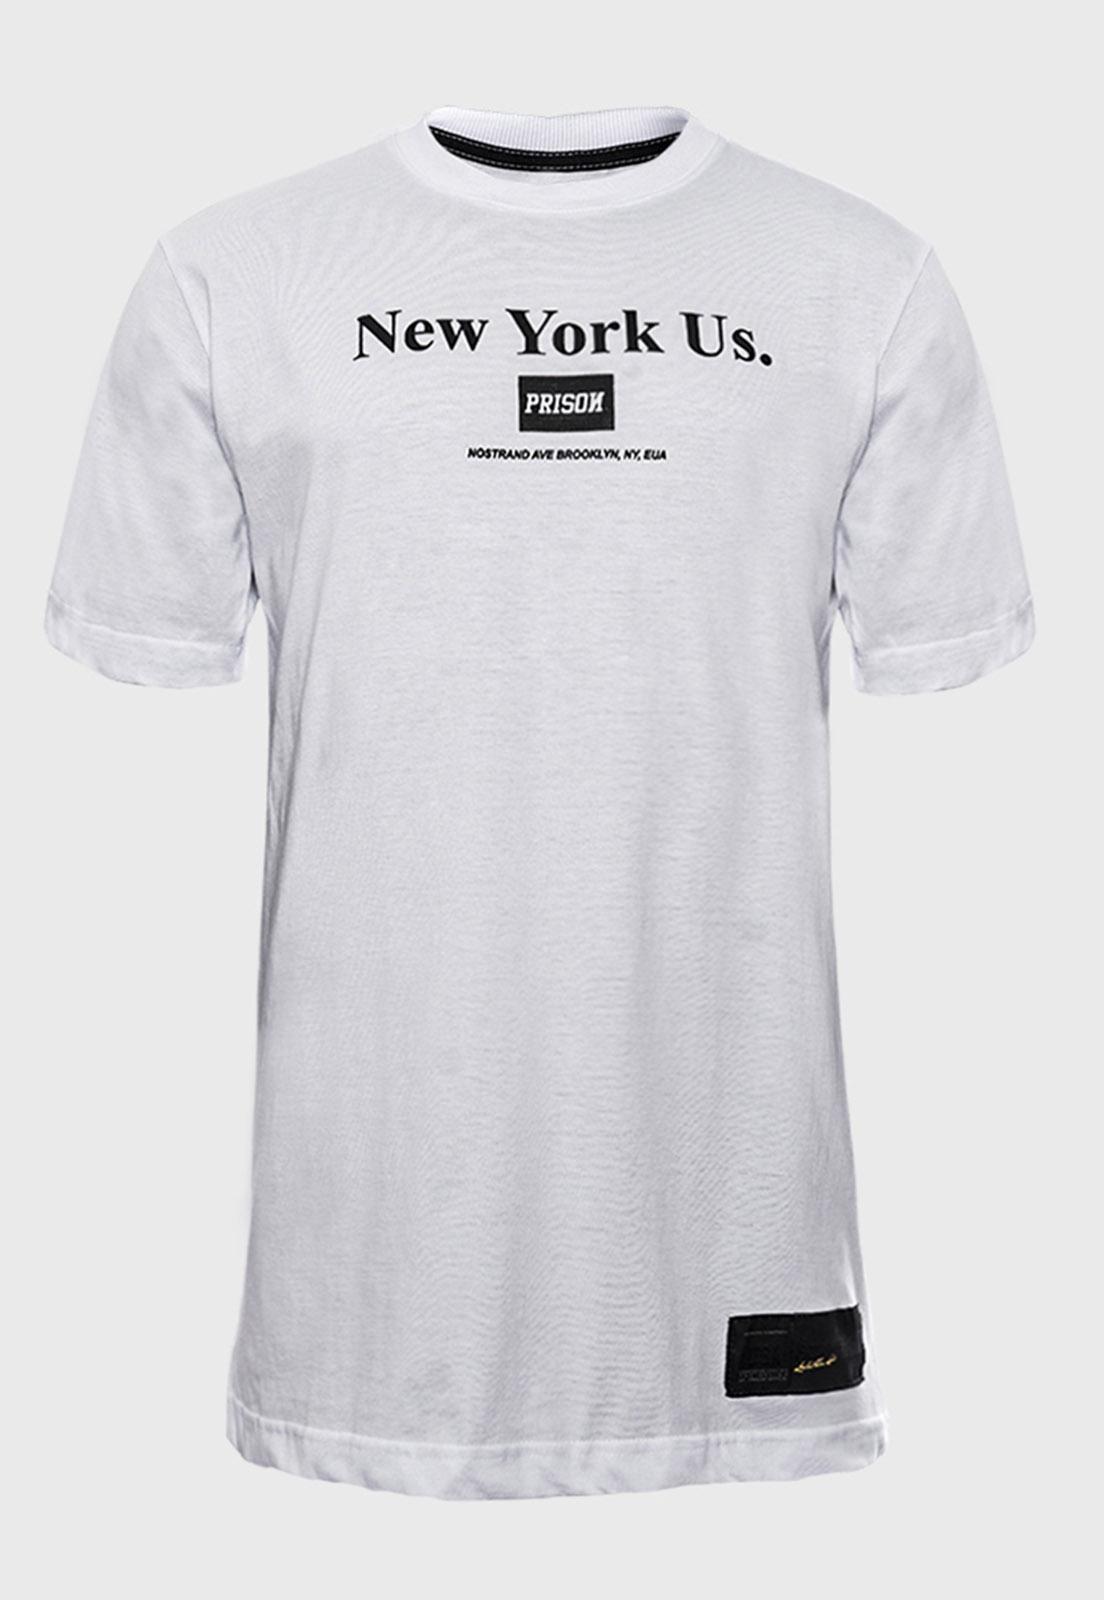 Camiseta Streetwear Prison New York US